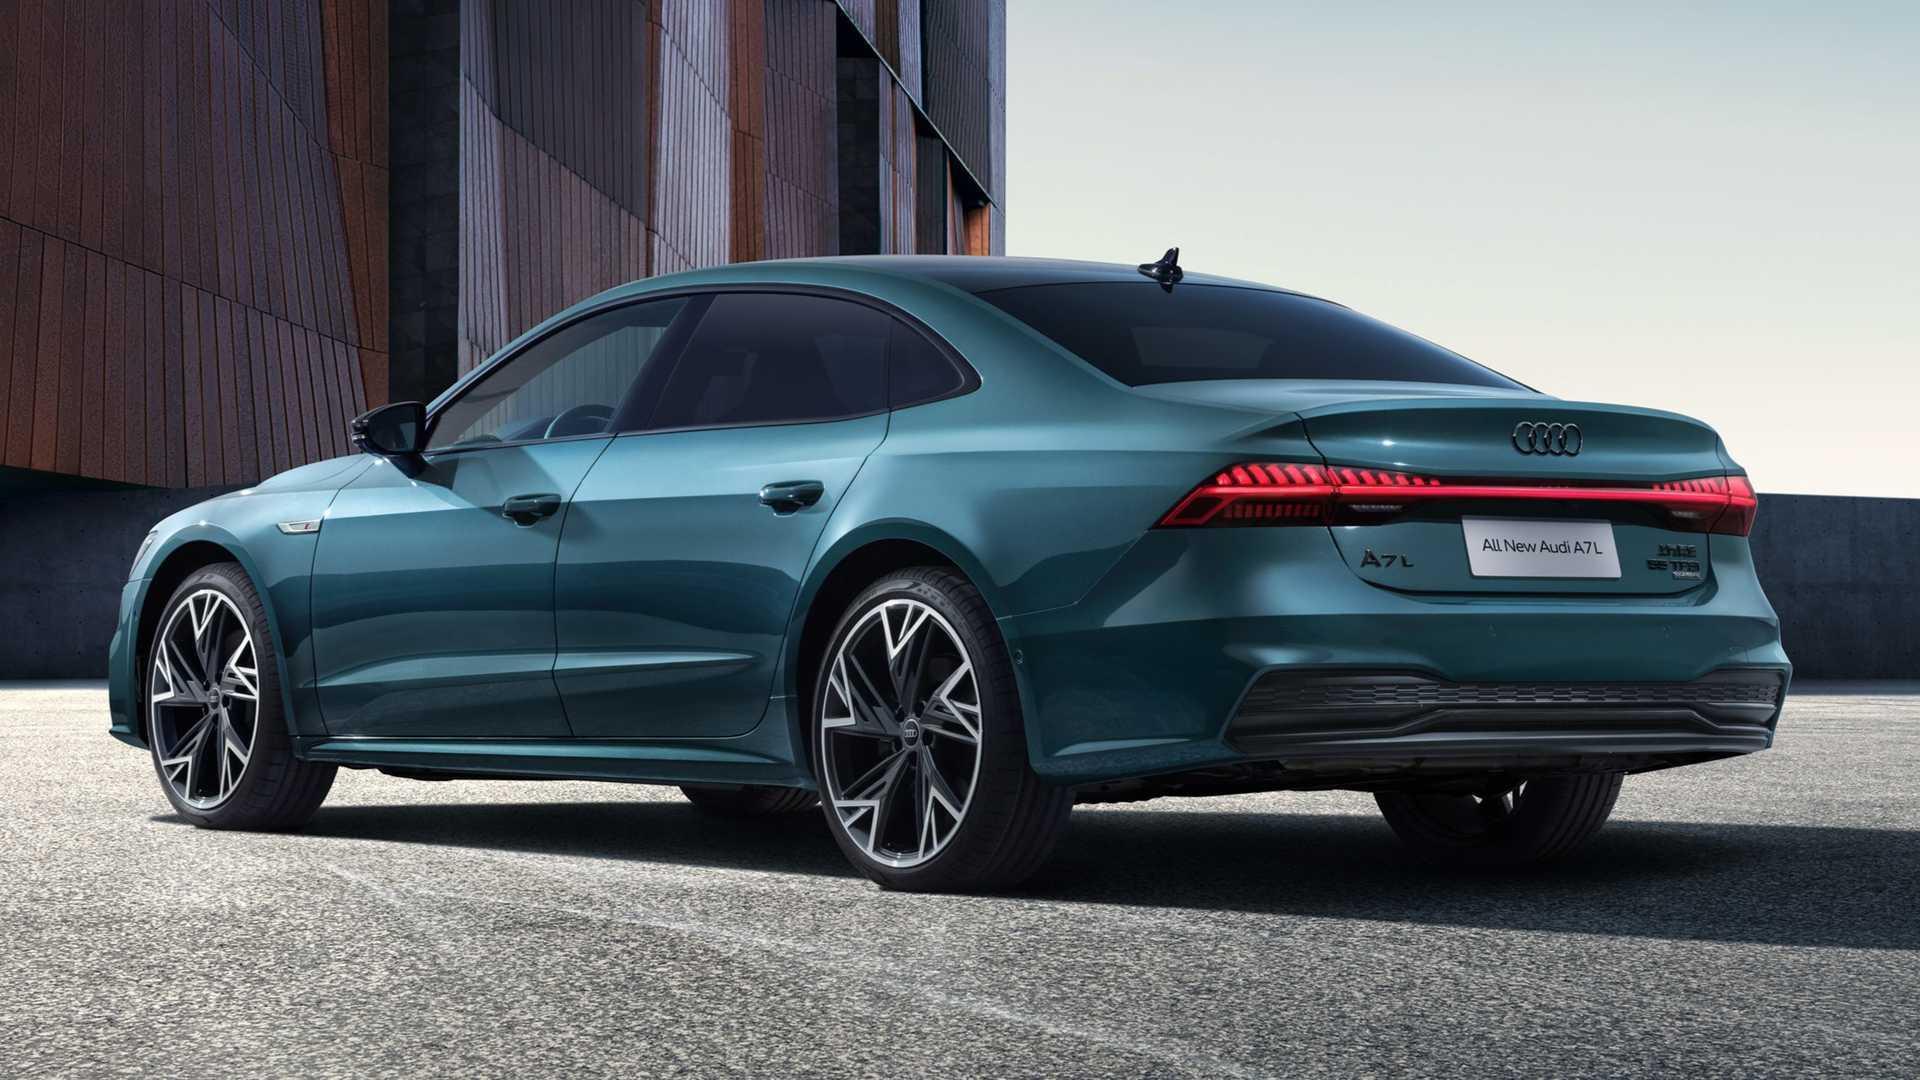 Audi A7 L (2021) für China: Limousine statt Sportback